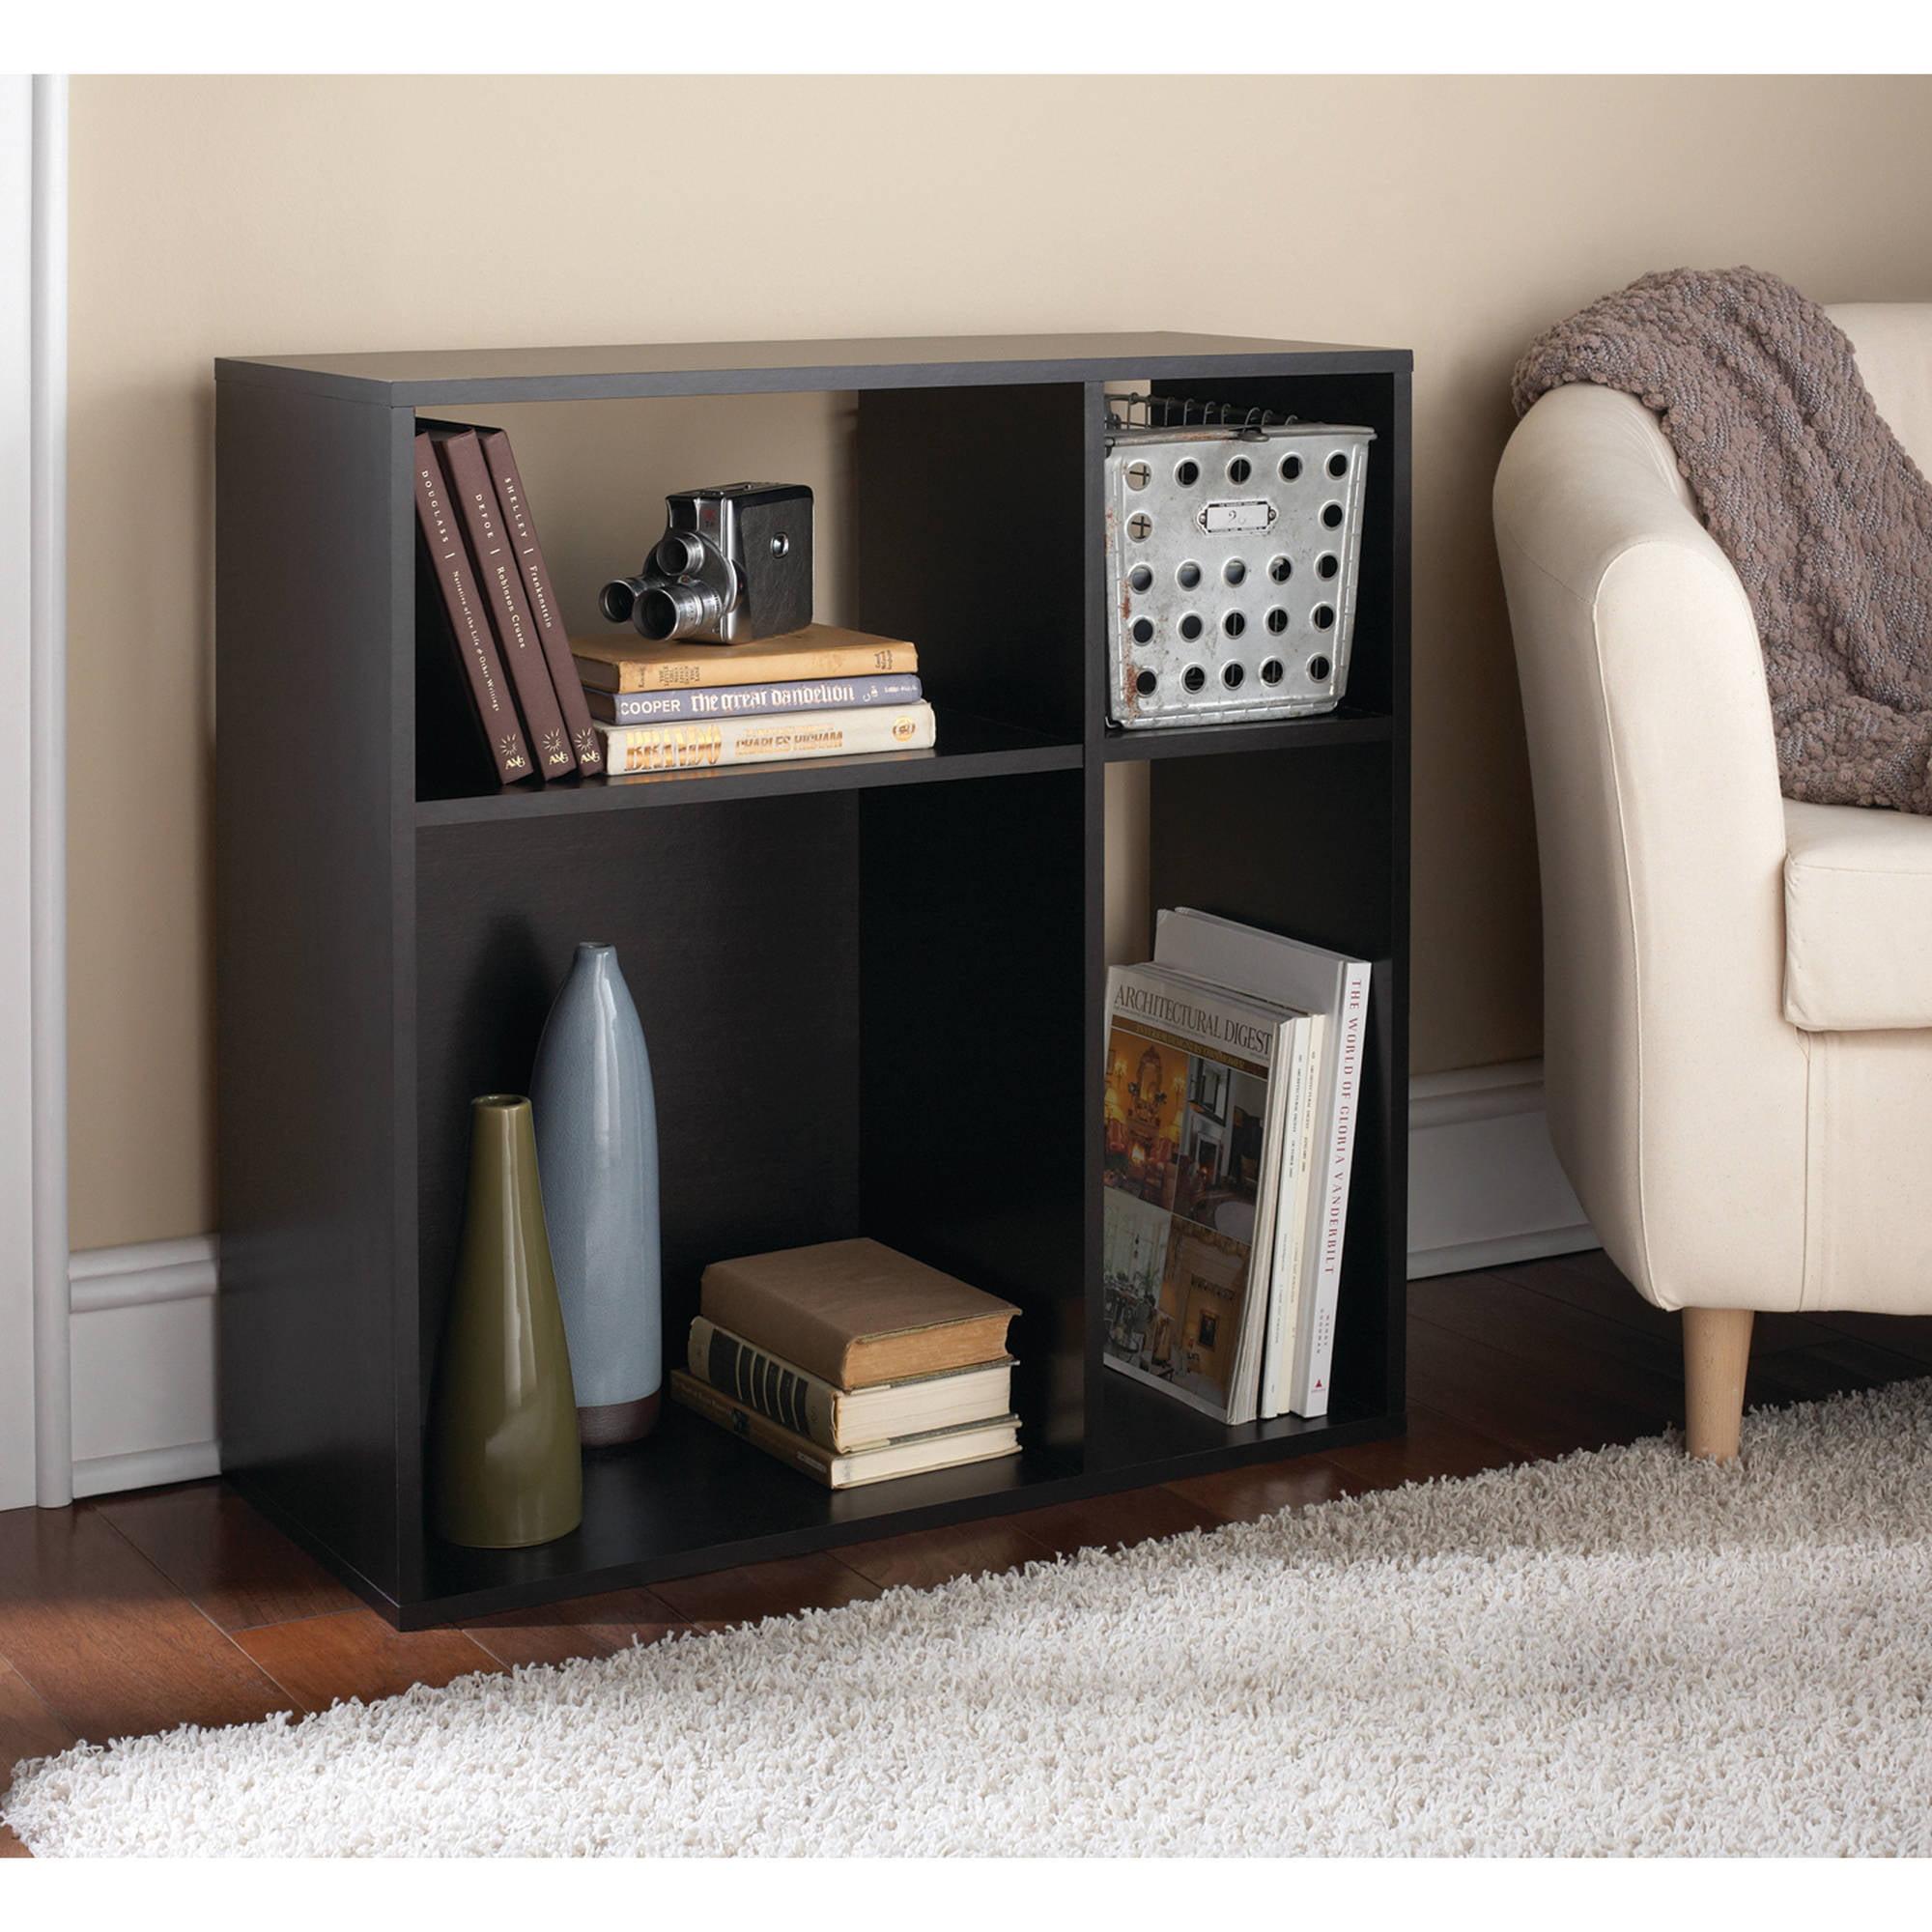 Bedroom Storage Shelves #27: Storage U0026amp; Organization - Walmart.com